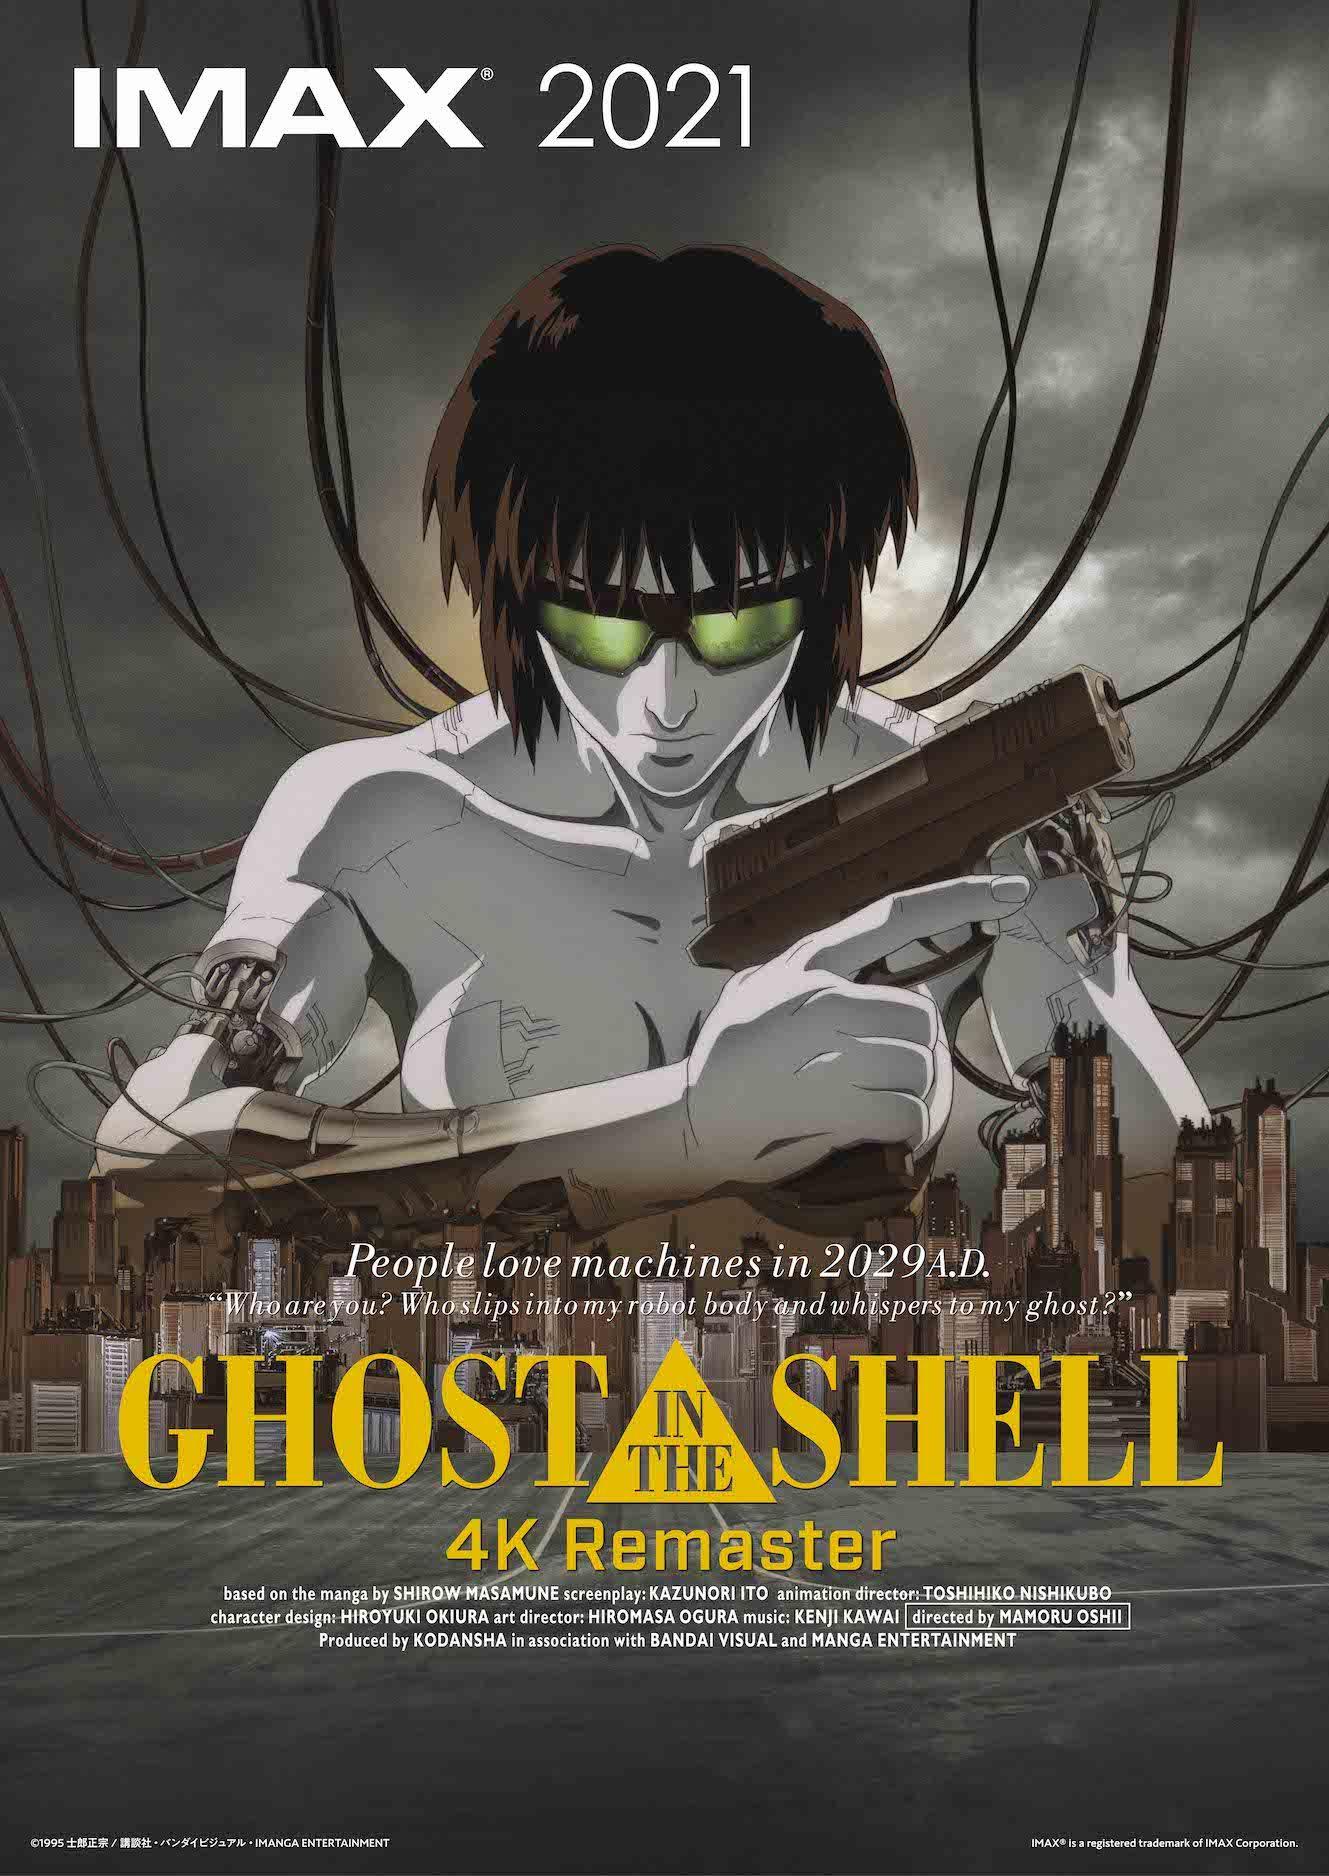 『GHOST IN THE SHELL/攻殻機動隊 4Kリマスター版』IMAX (c)1995 士郎正宗/講談社・バンダイビジュアル・MANGA ENTERTAINMENT